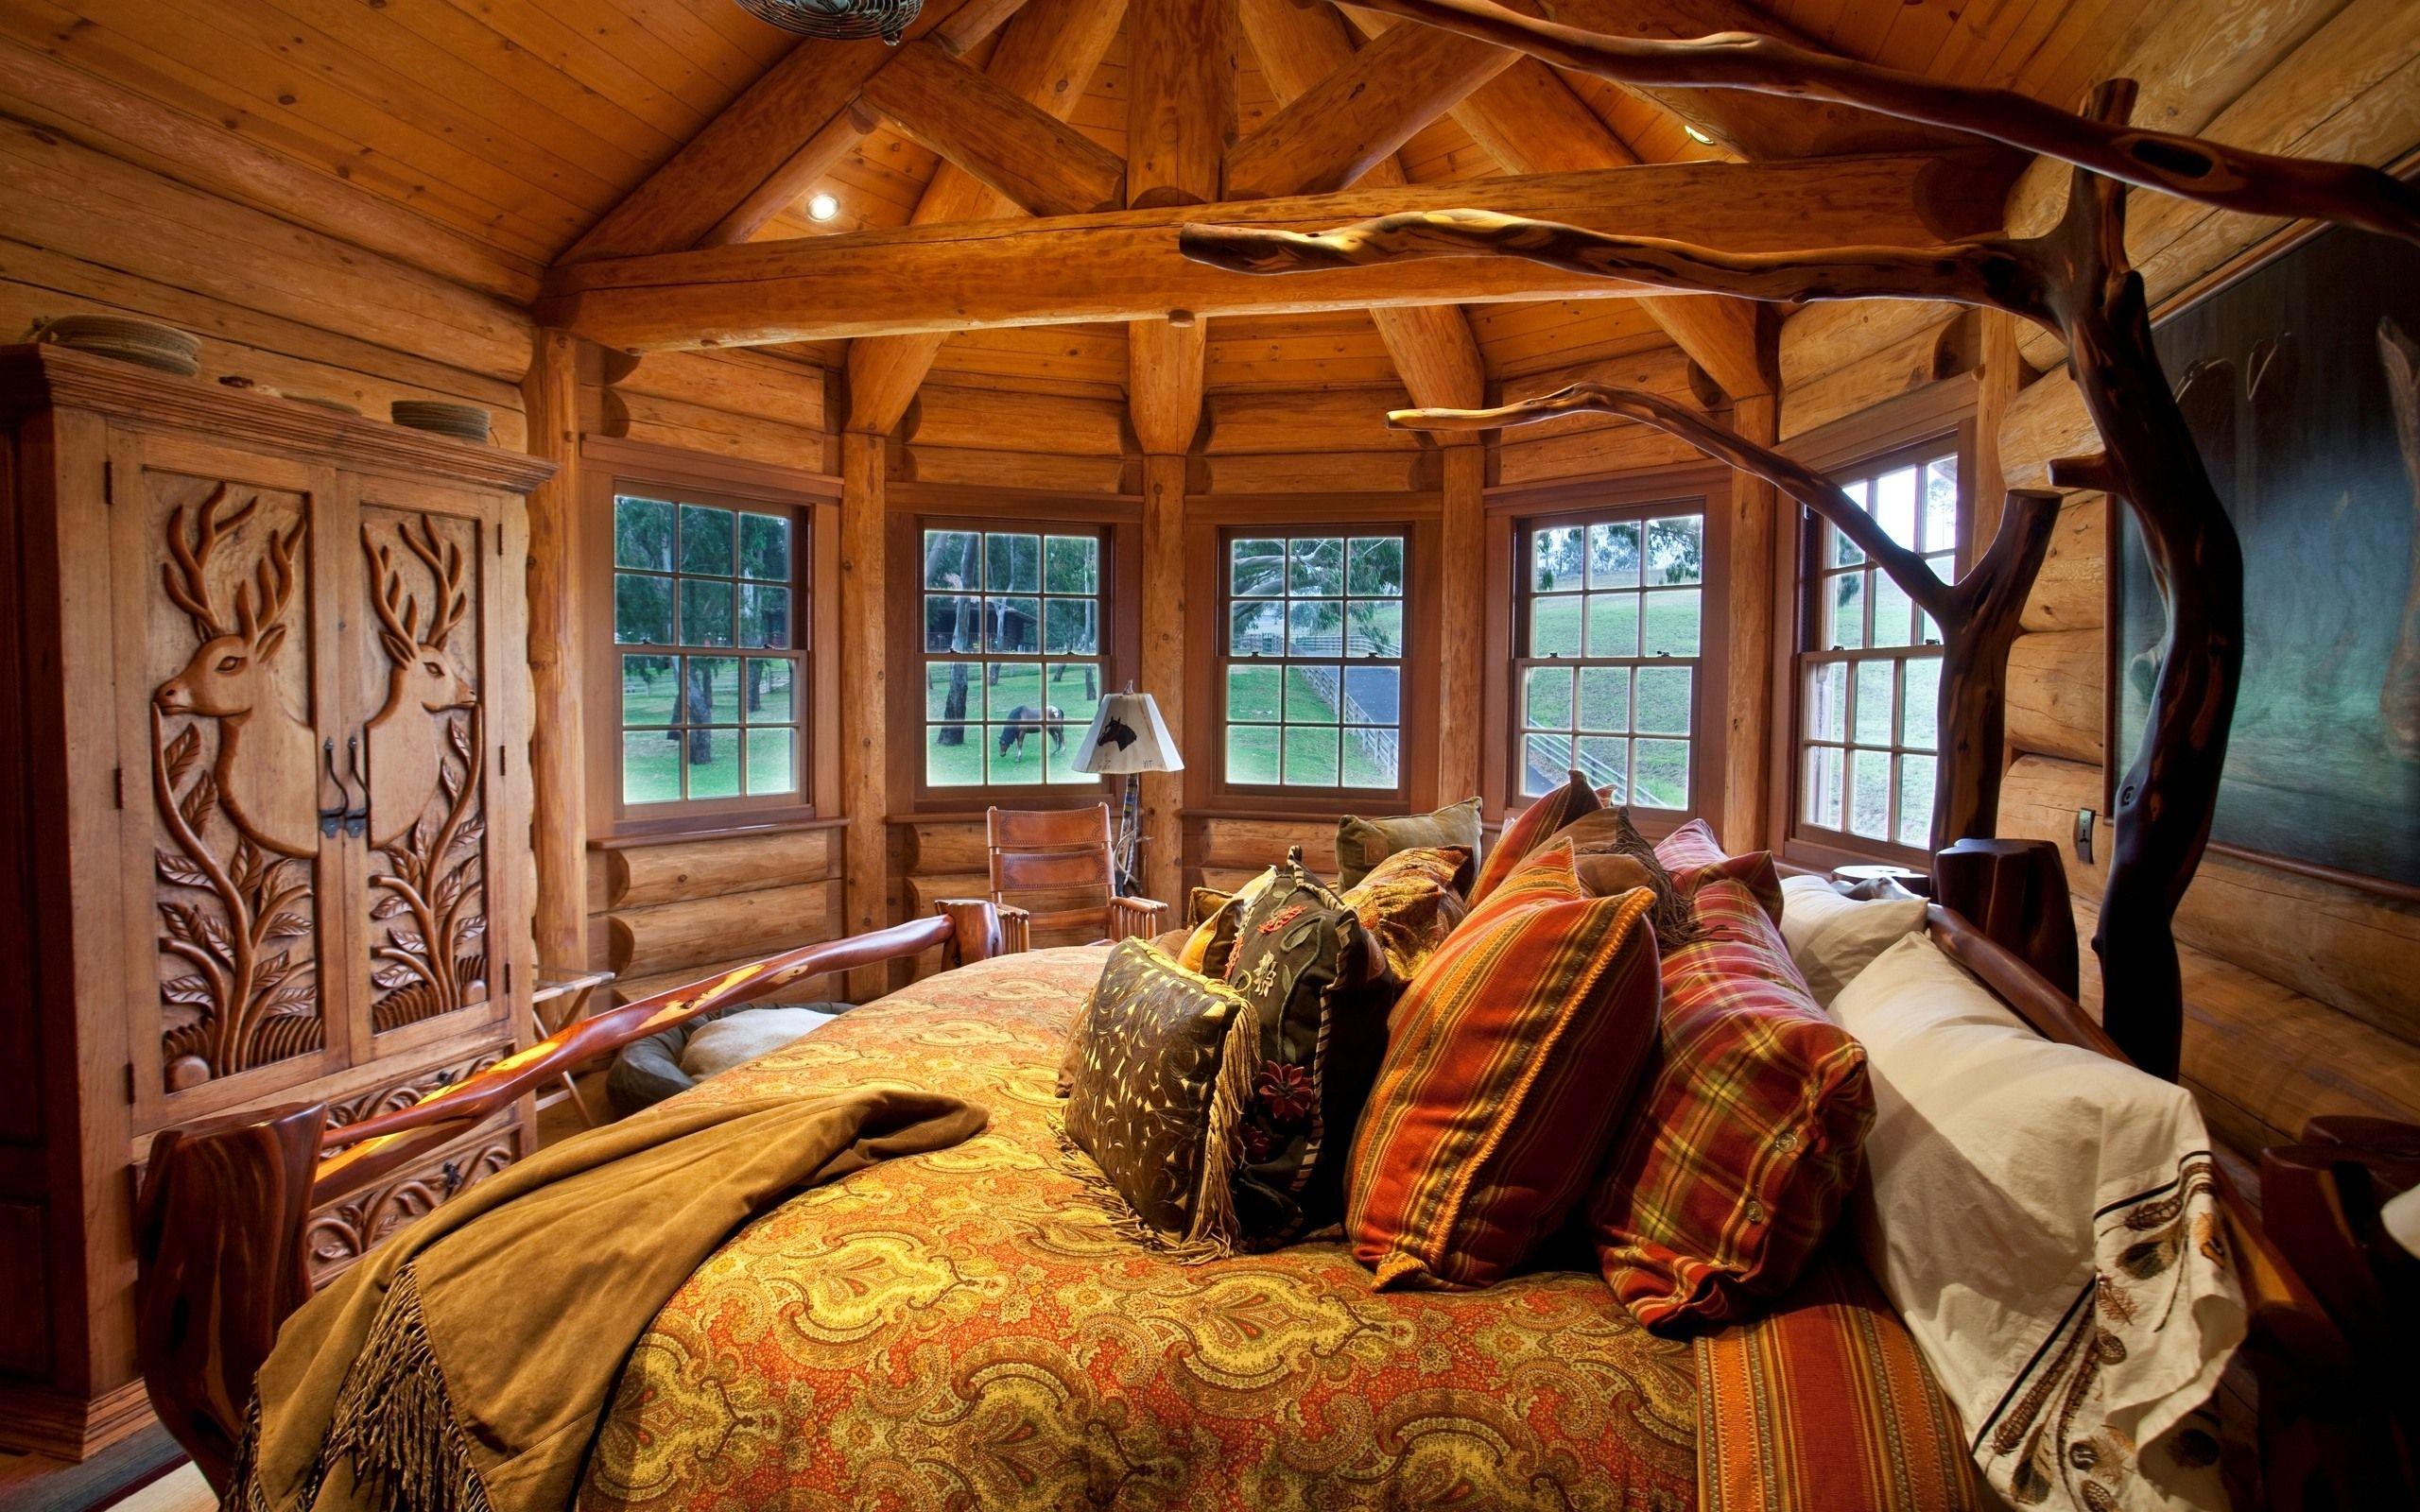 yahoo rustic country bedroom decorating ideas. beautiful ideas. Home Design Ideas